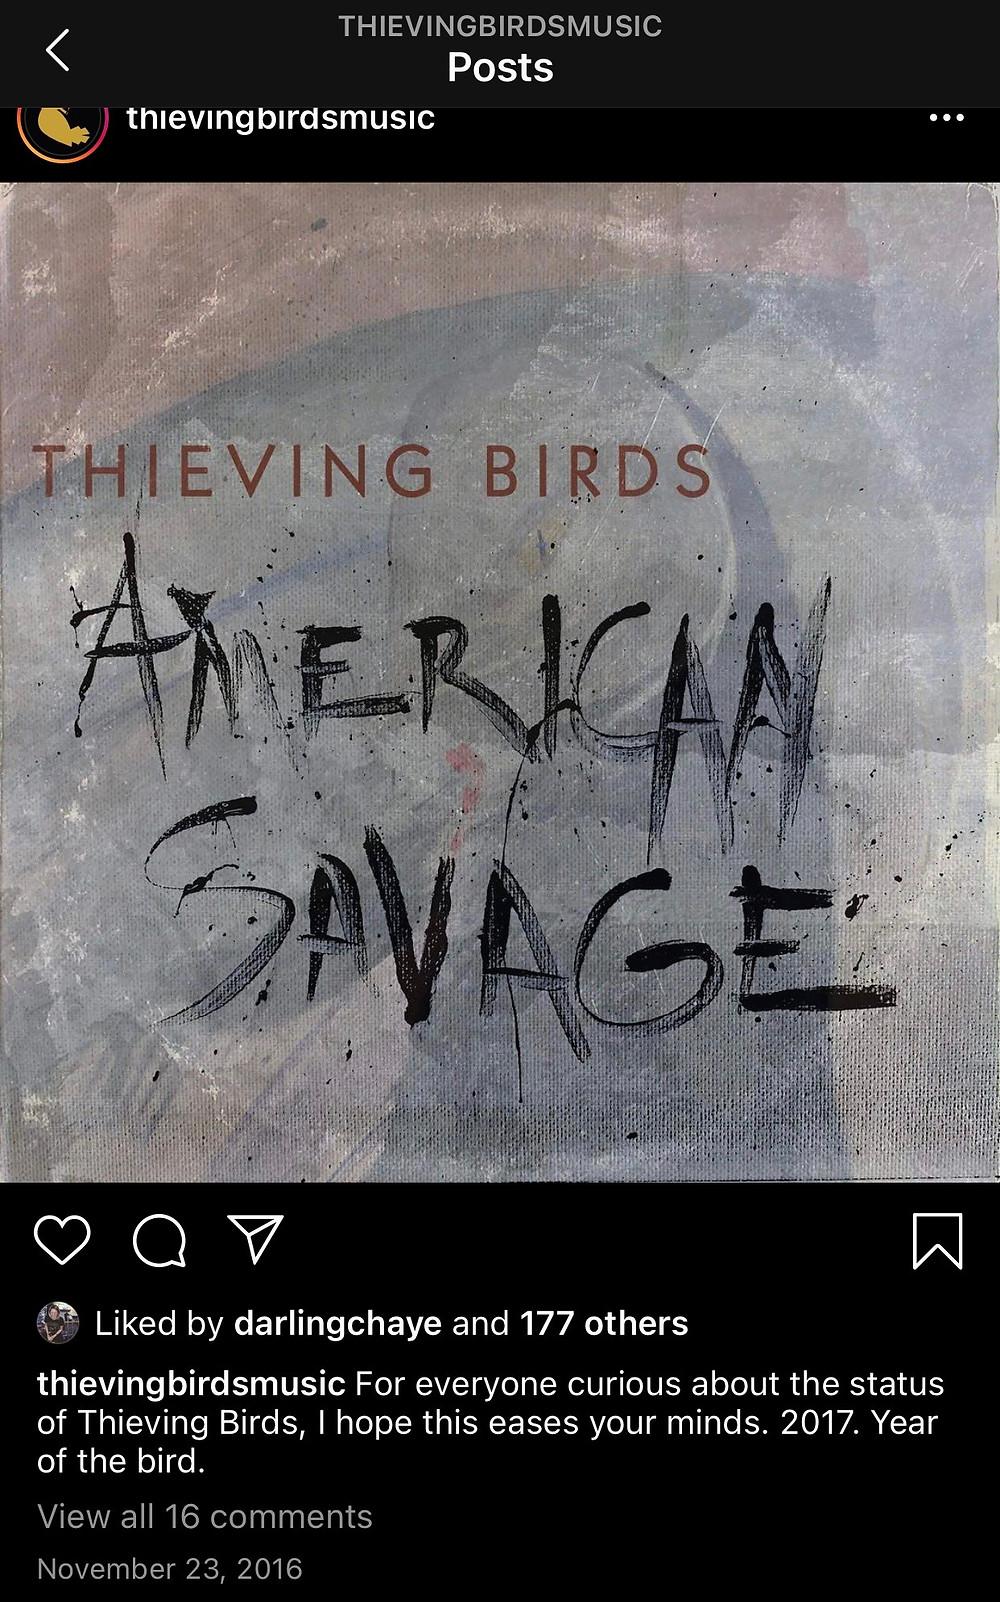 thieving birds new album instagram post